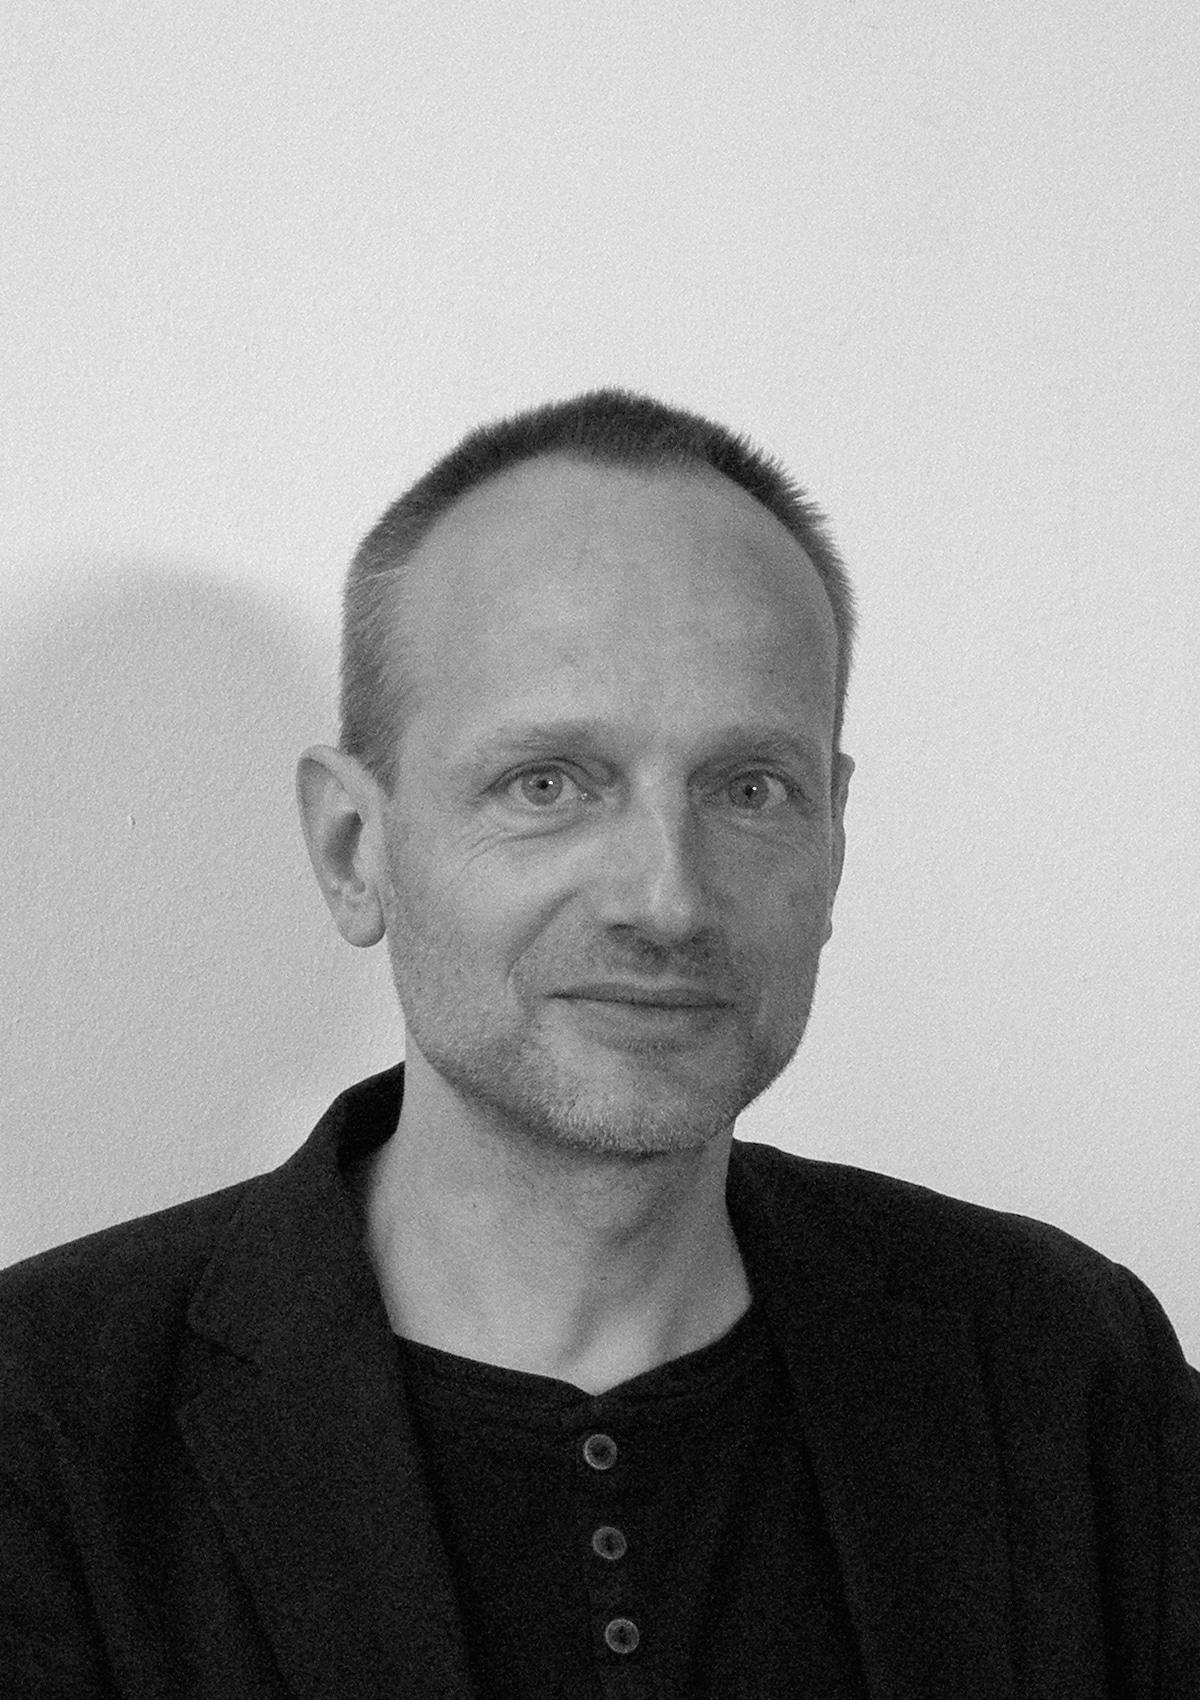 Tobias From Kassel, Germany